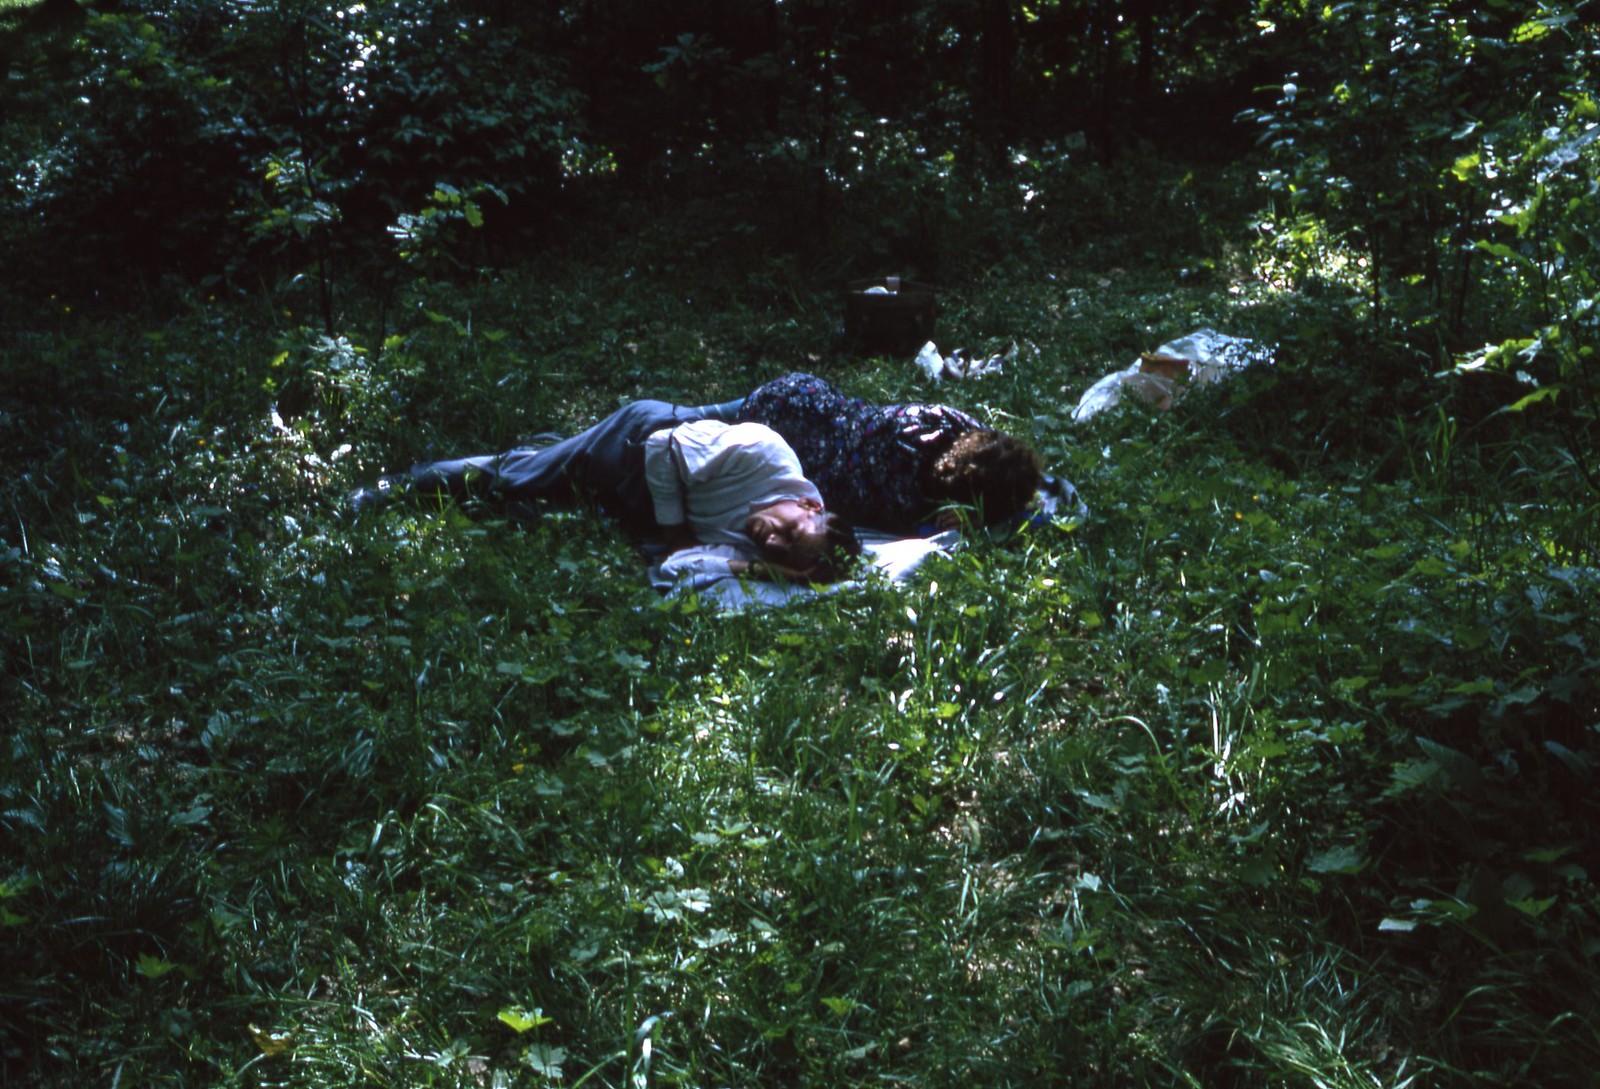 hammond-MA10-Ostankino-people-sunbathing-and-fishing-013